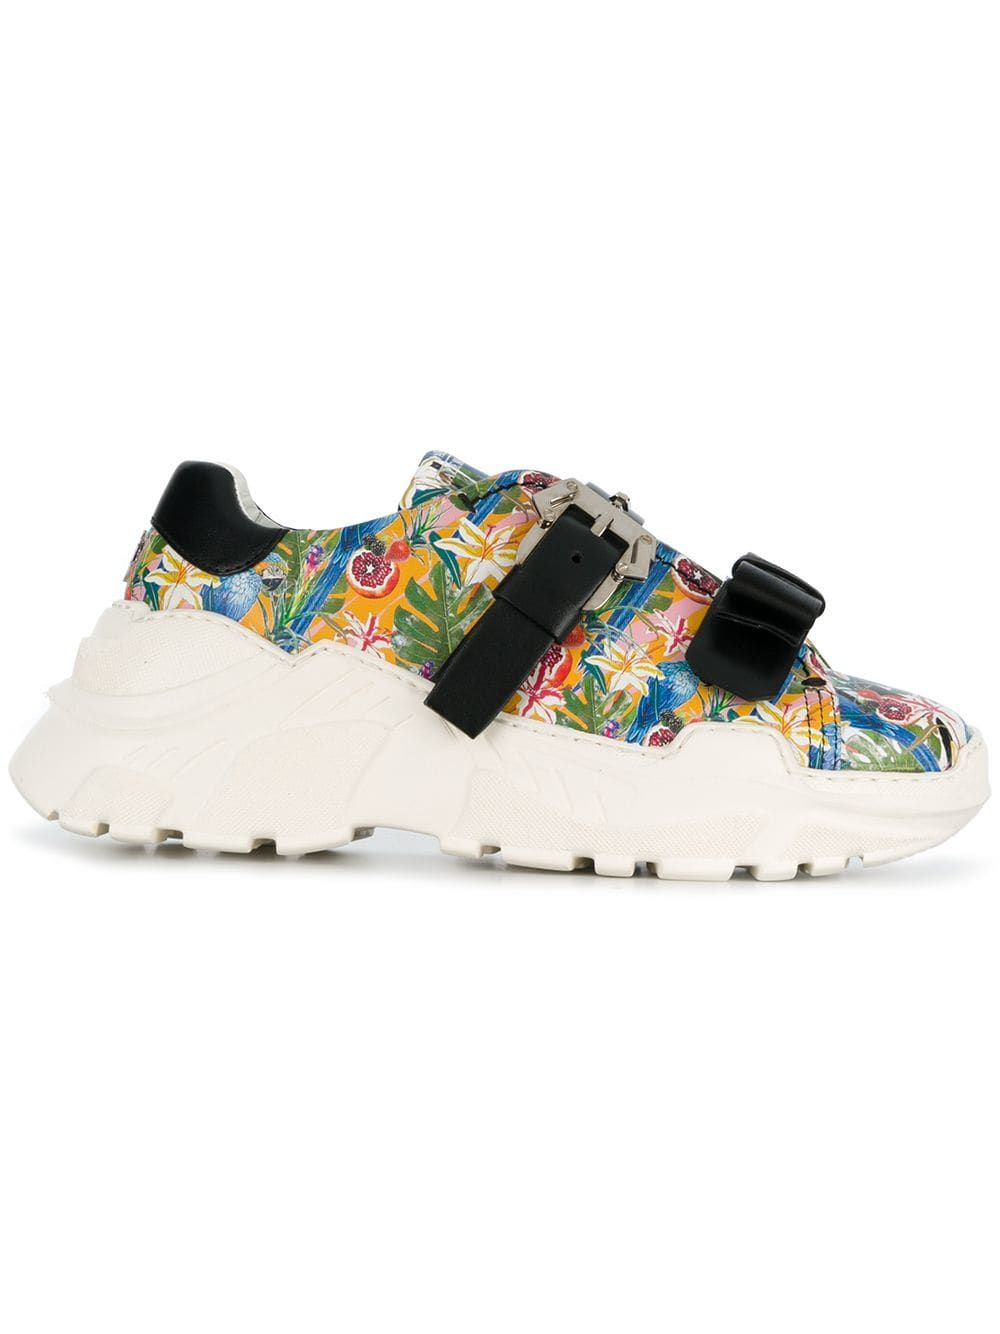 cb8e79b453b0 Paula Cademartori Yokoo | sneakers | Paula cademartori, Sneakers ...